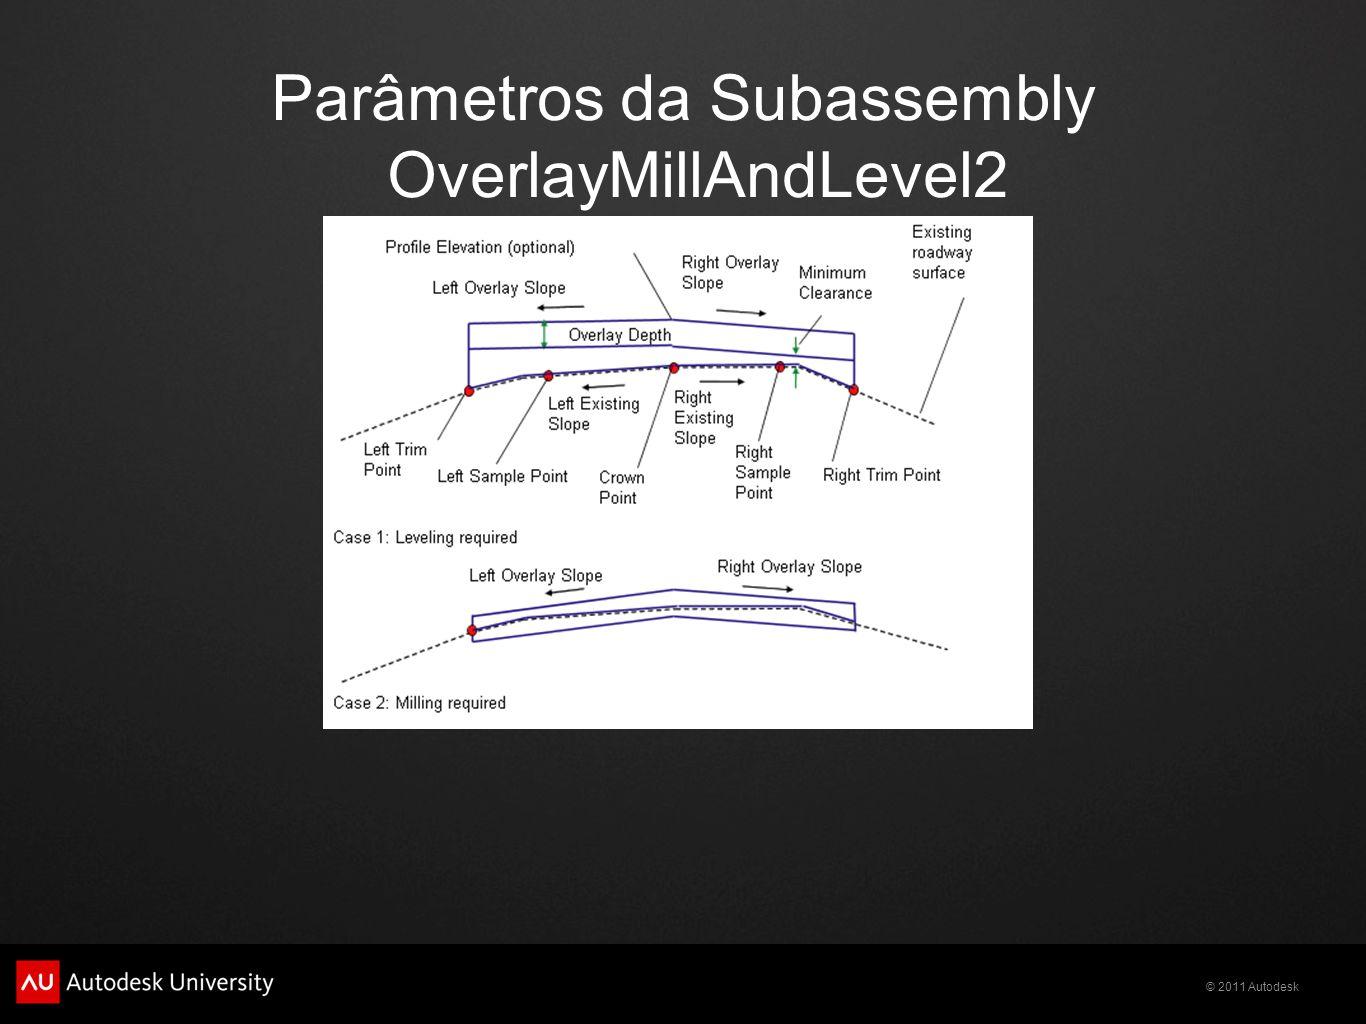 Parâmetros da Subassembly OverlayMillAndLevel2